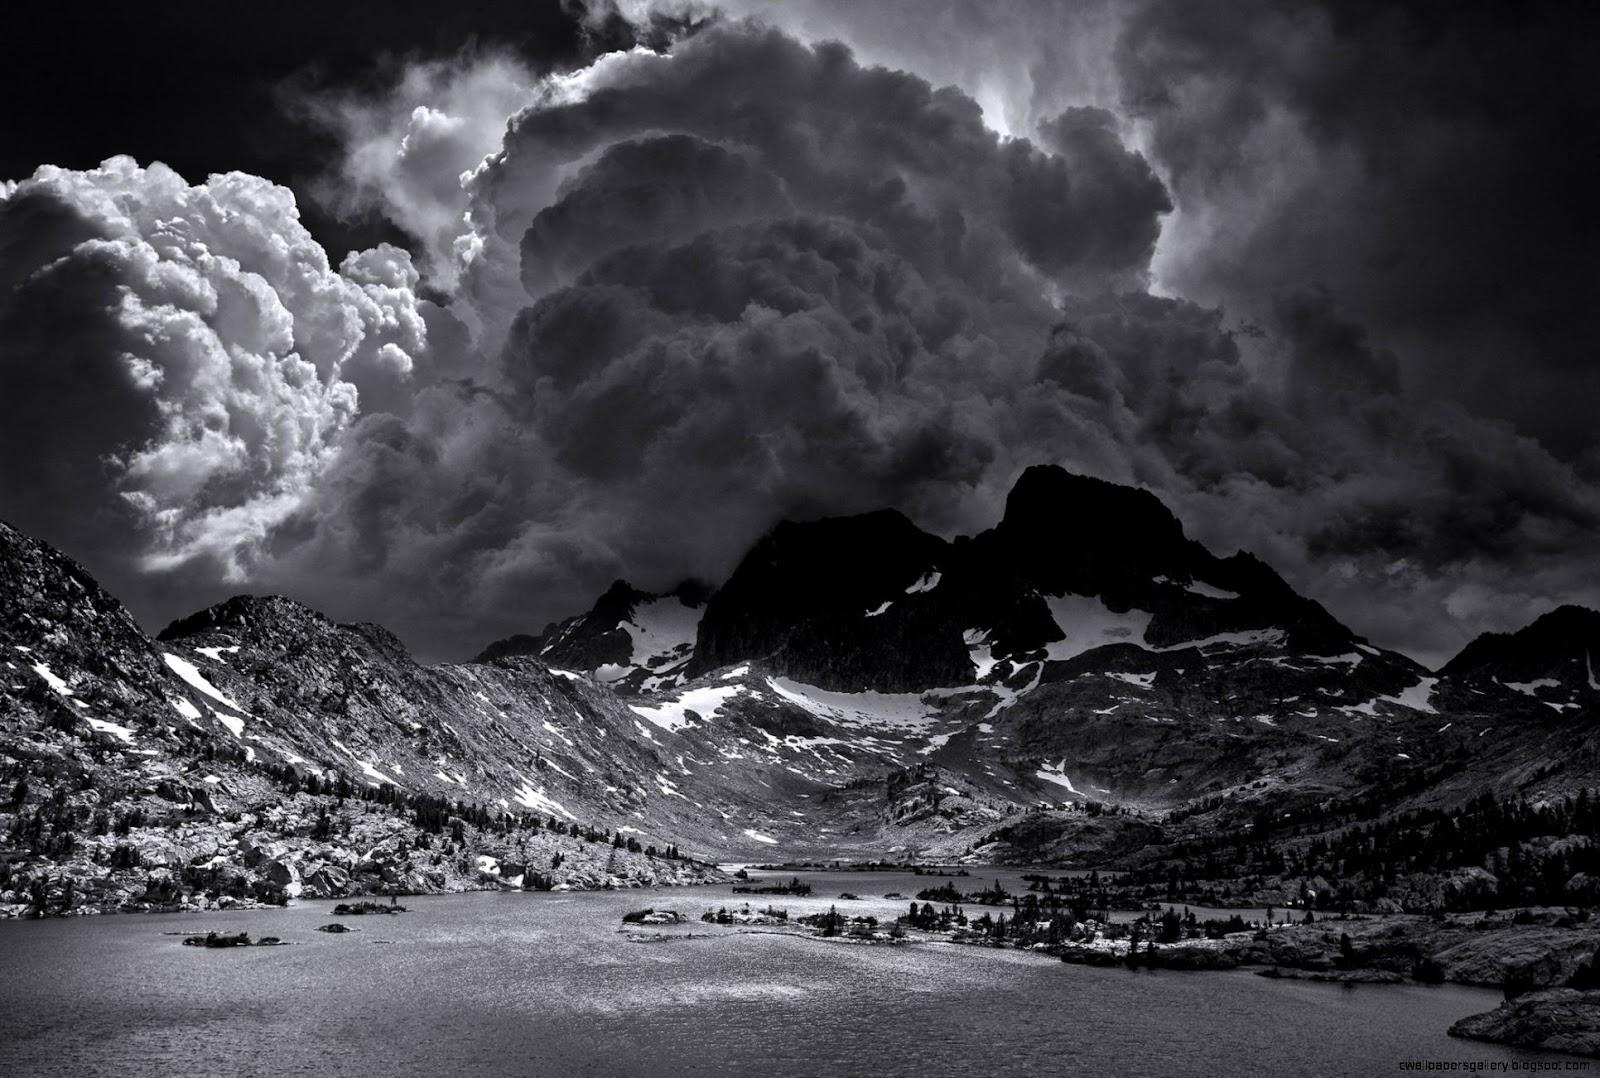 Ansel Adams Landscape Photography